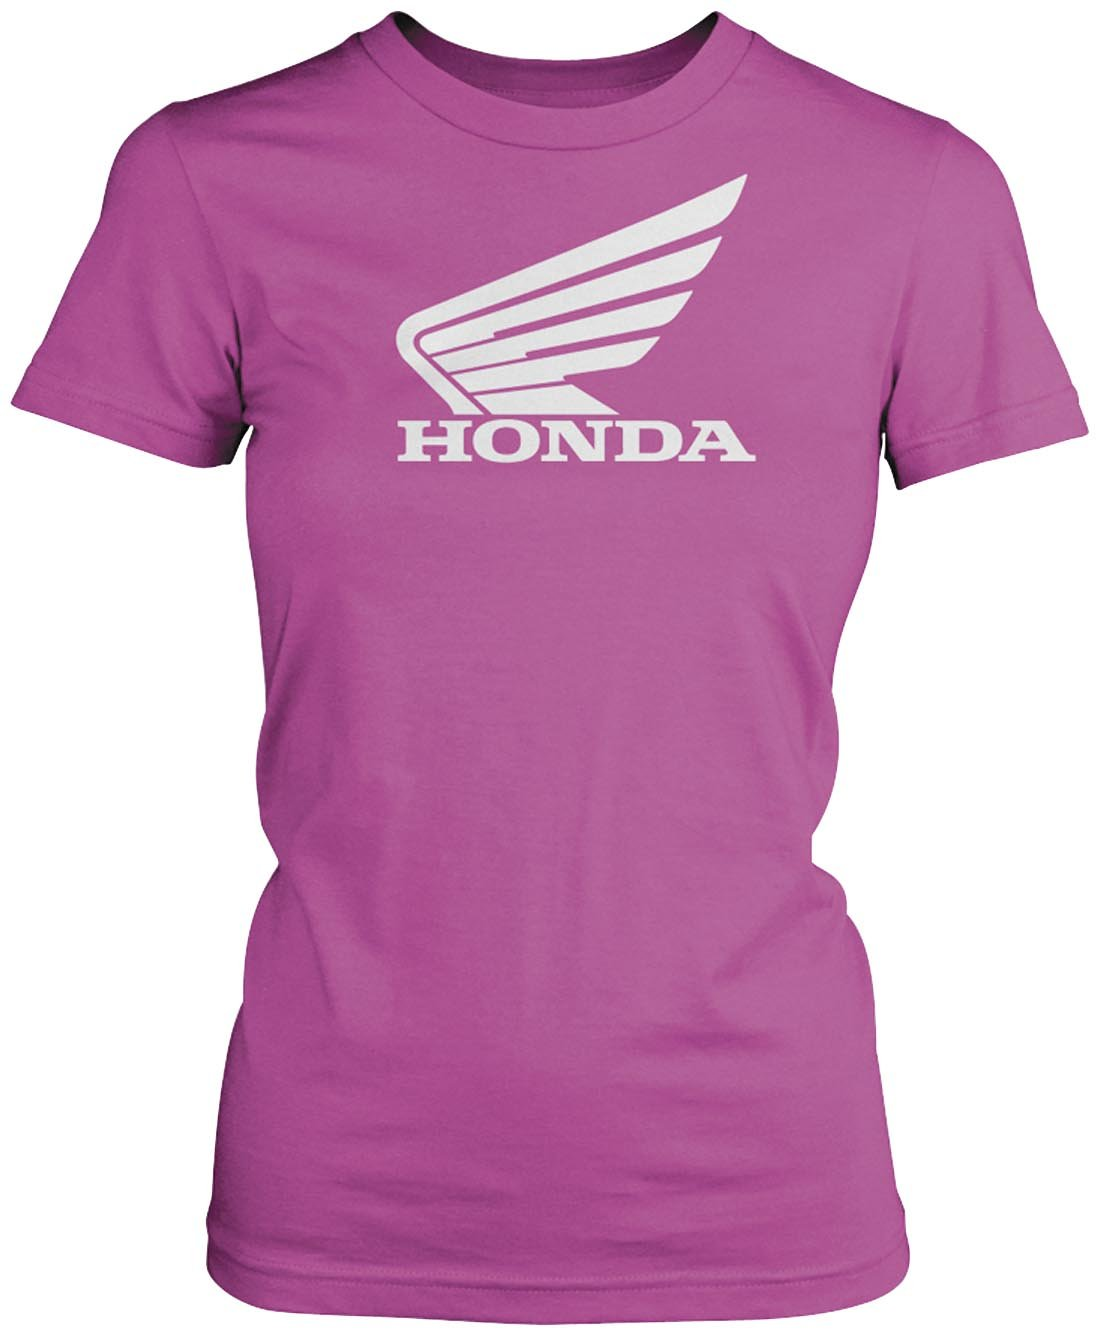 Honda Womens Big Wing Short-Sleeve T-Shirt/Tee, Pink, X-Large